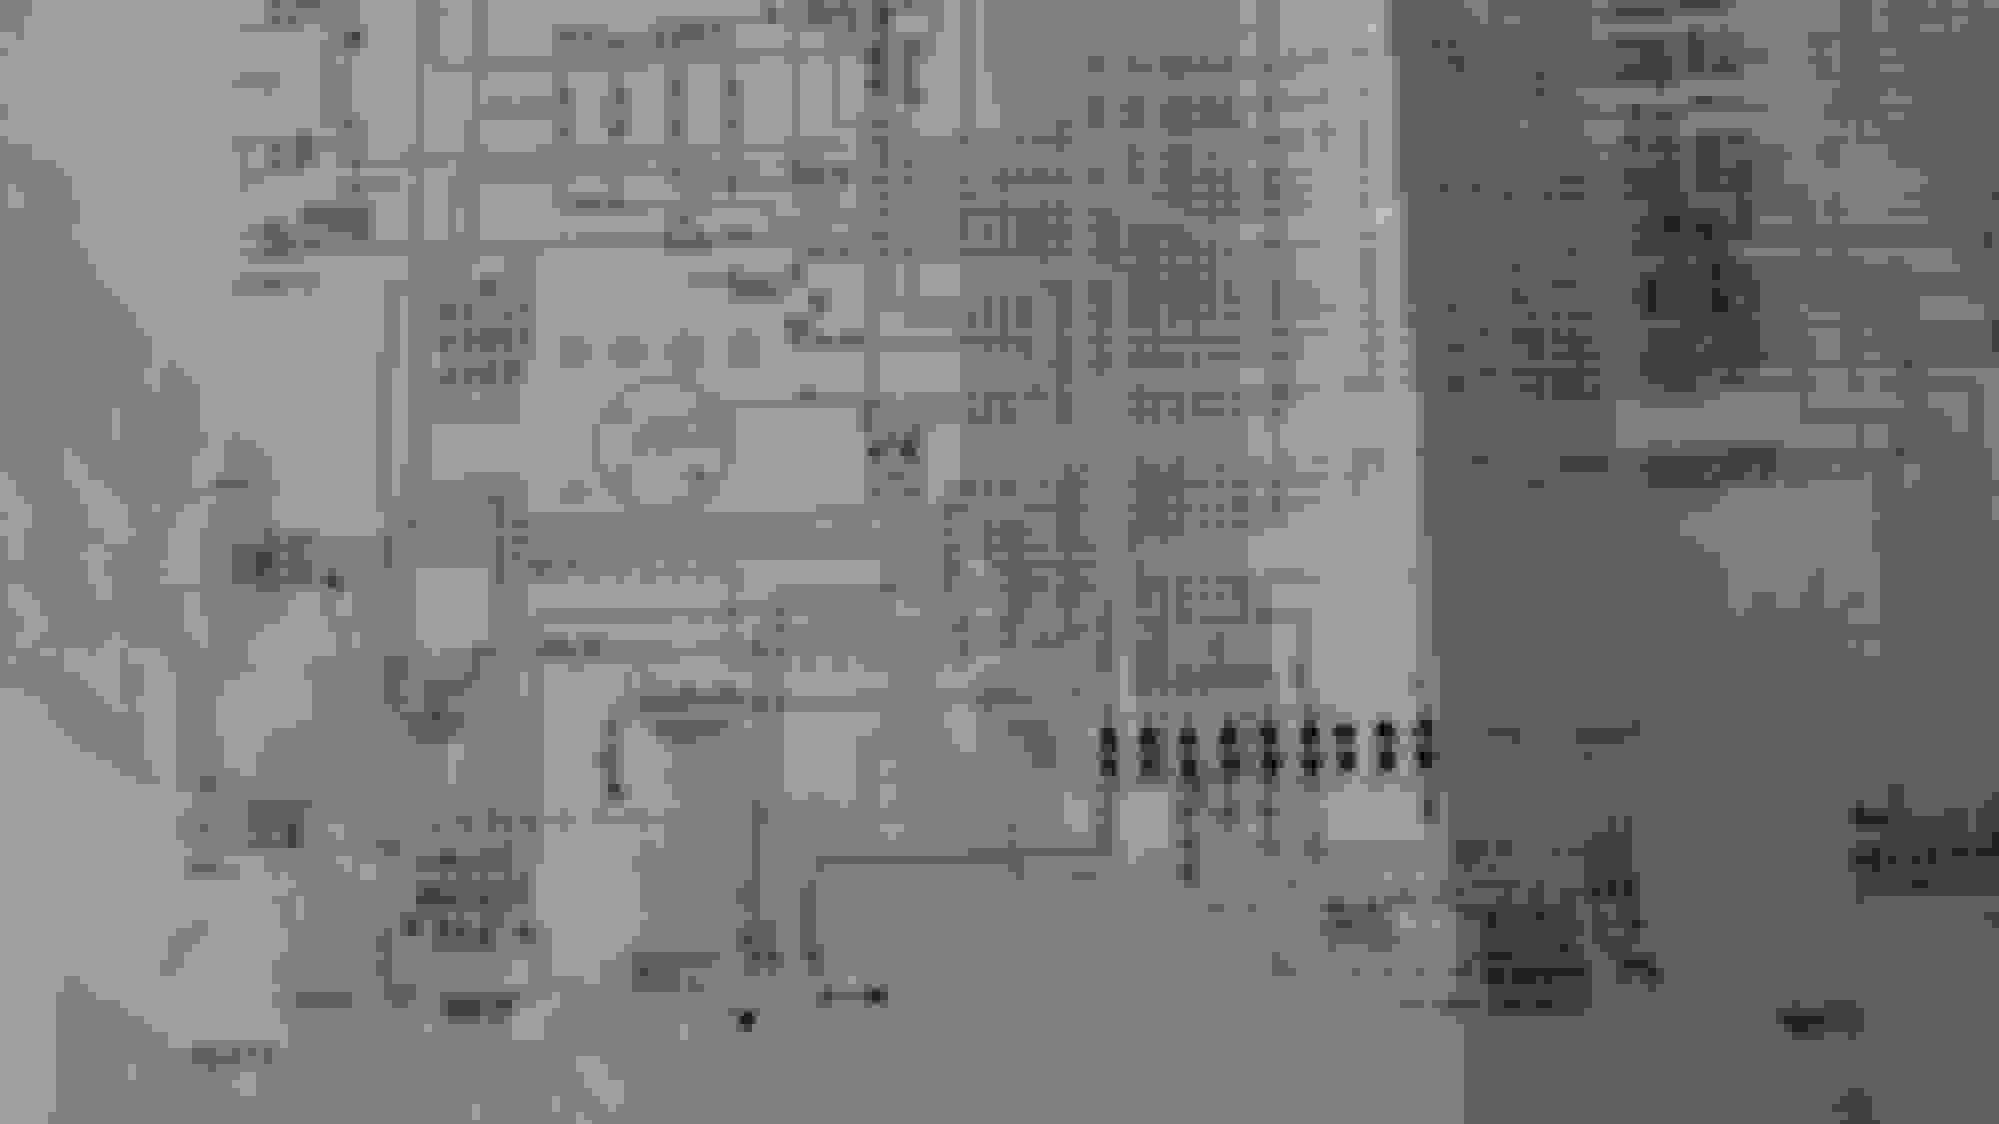 Early 944 fan wiring mystery... - Rennlist - Porsche ... on tractor key, valve key, ford key, wiring diagrams for peterbilt trucks, radiator key, honda key, flywheel key,